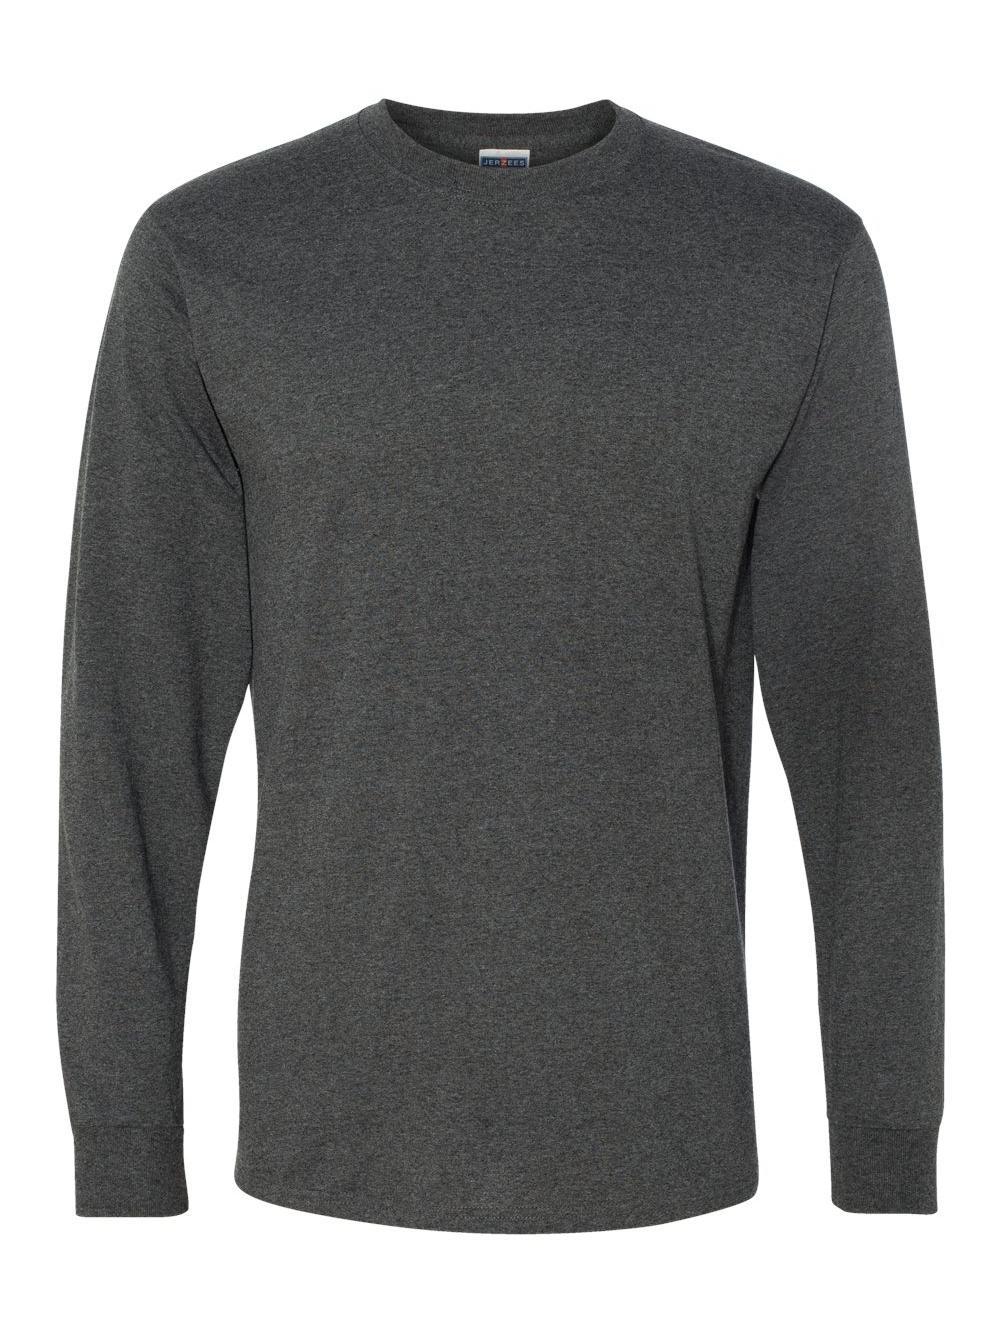 Jerzees-Dri-Power-Long-Sleeve-50-50-T-Shirt-29LSR thumbnail 12